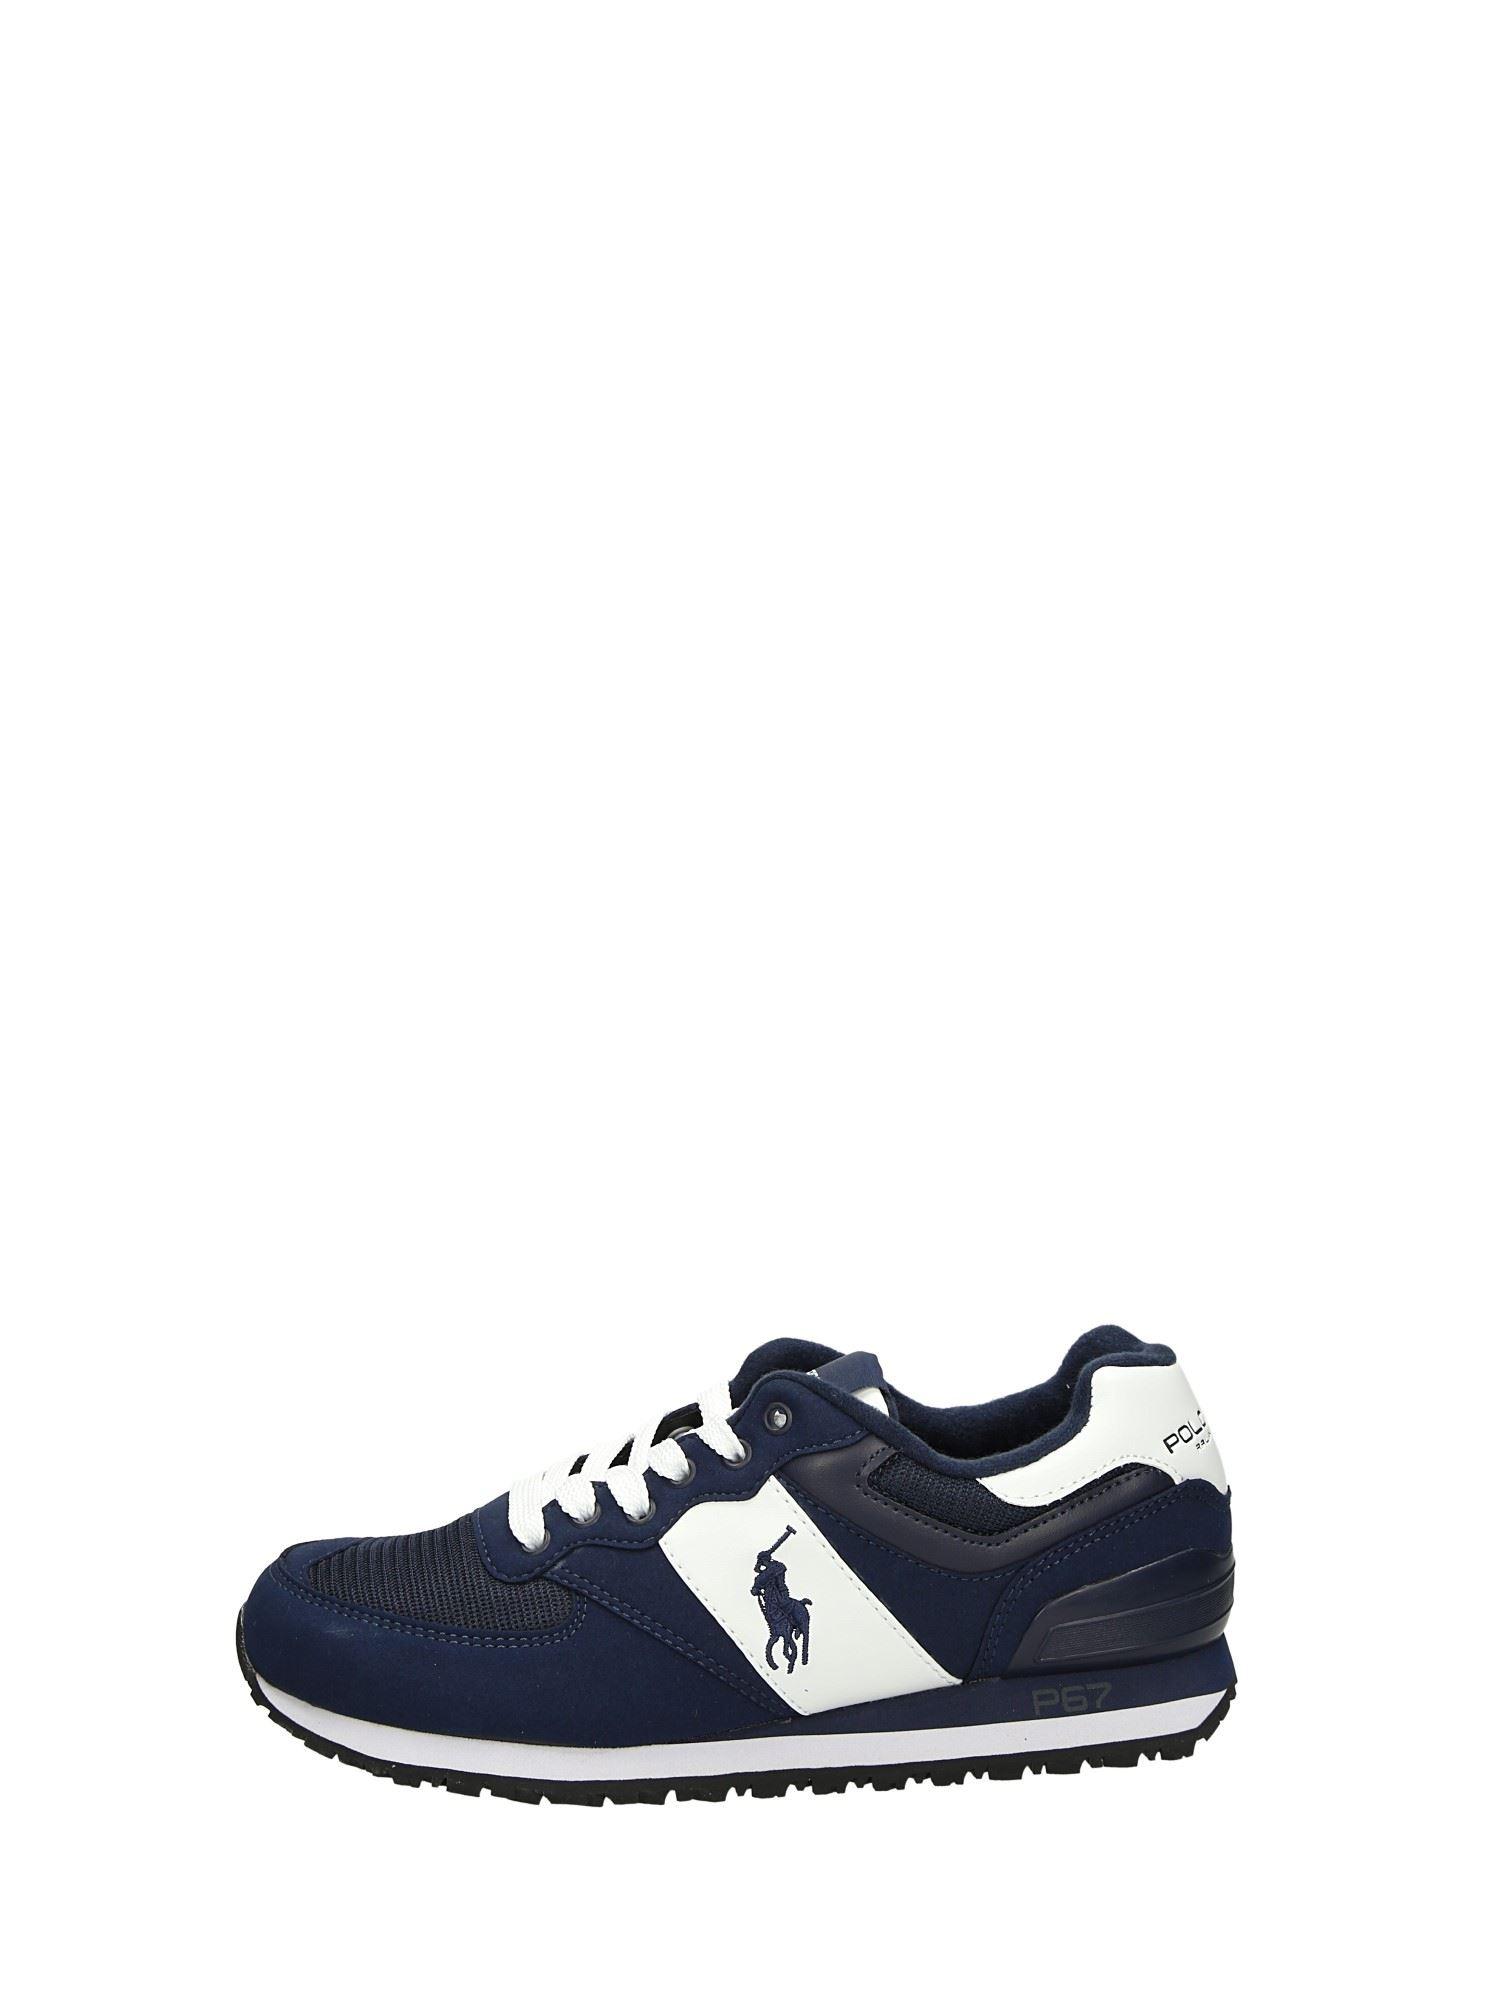 Polo Ralph Lauren SLATON PONY Blu Scarpe Uomo Sneakers 61216999cfc